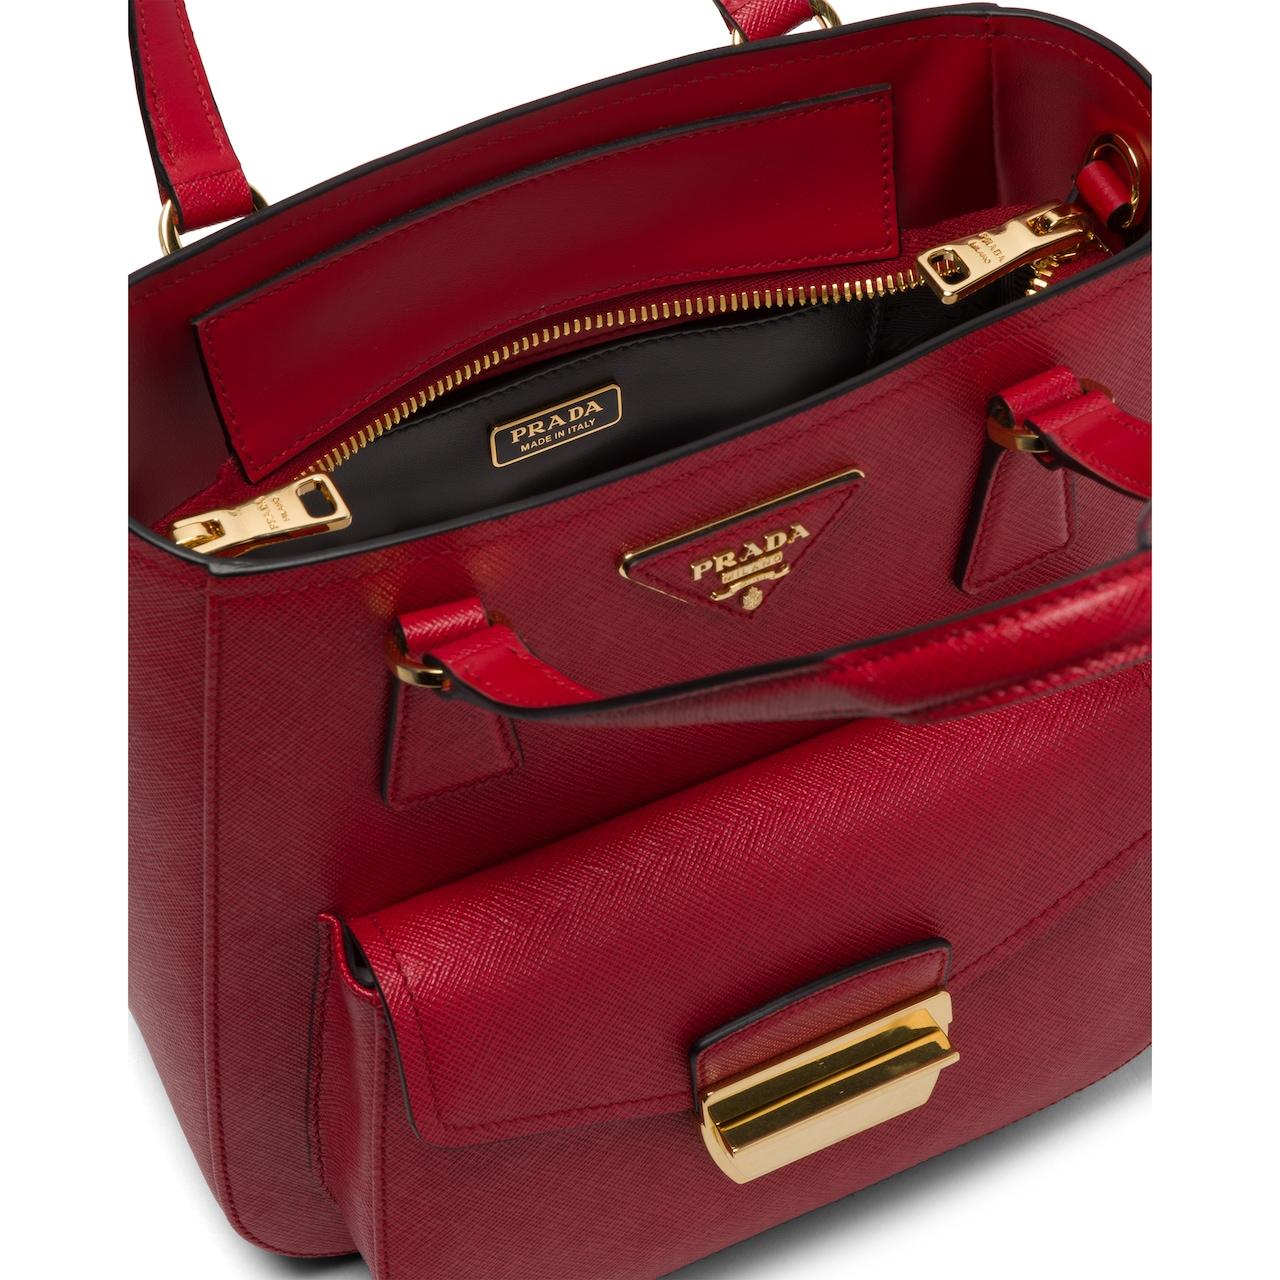 Prada Prada Metropolis handbag 5